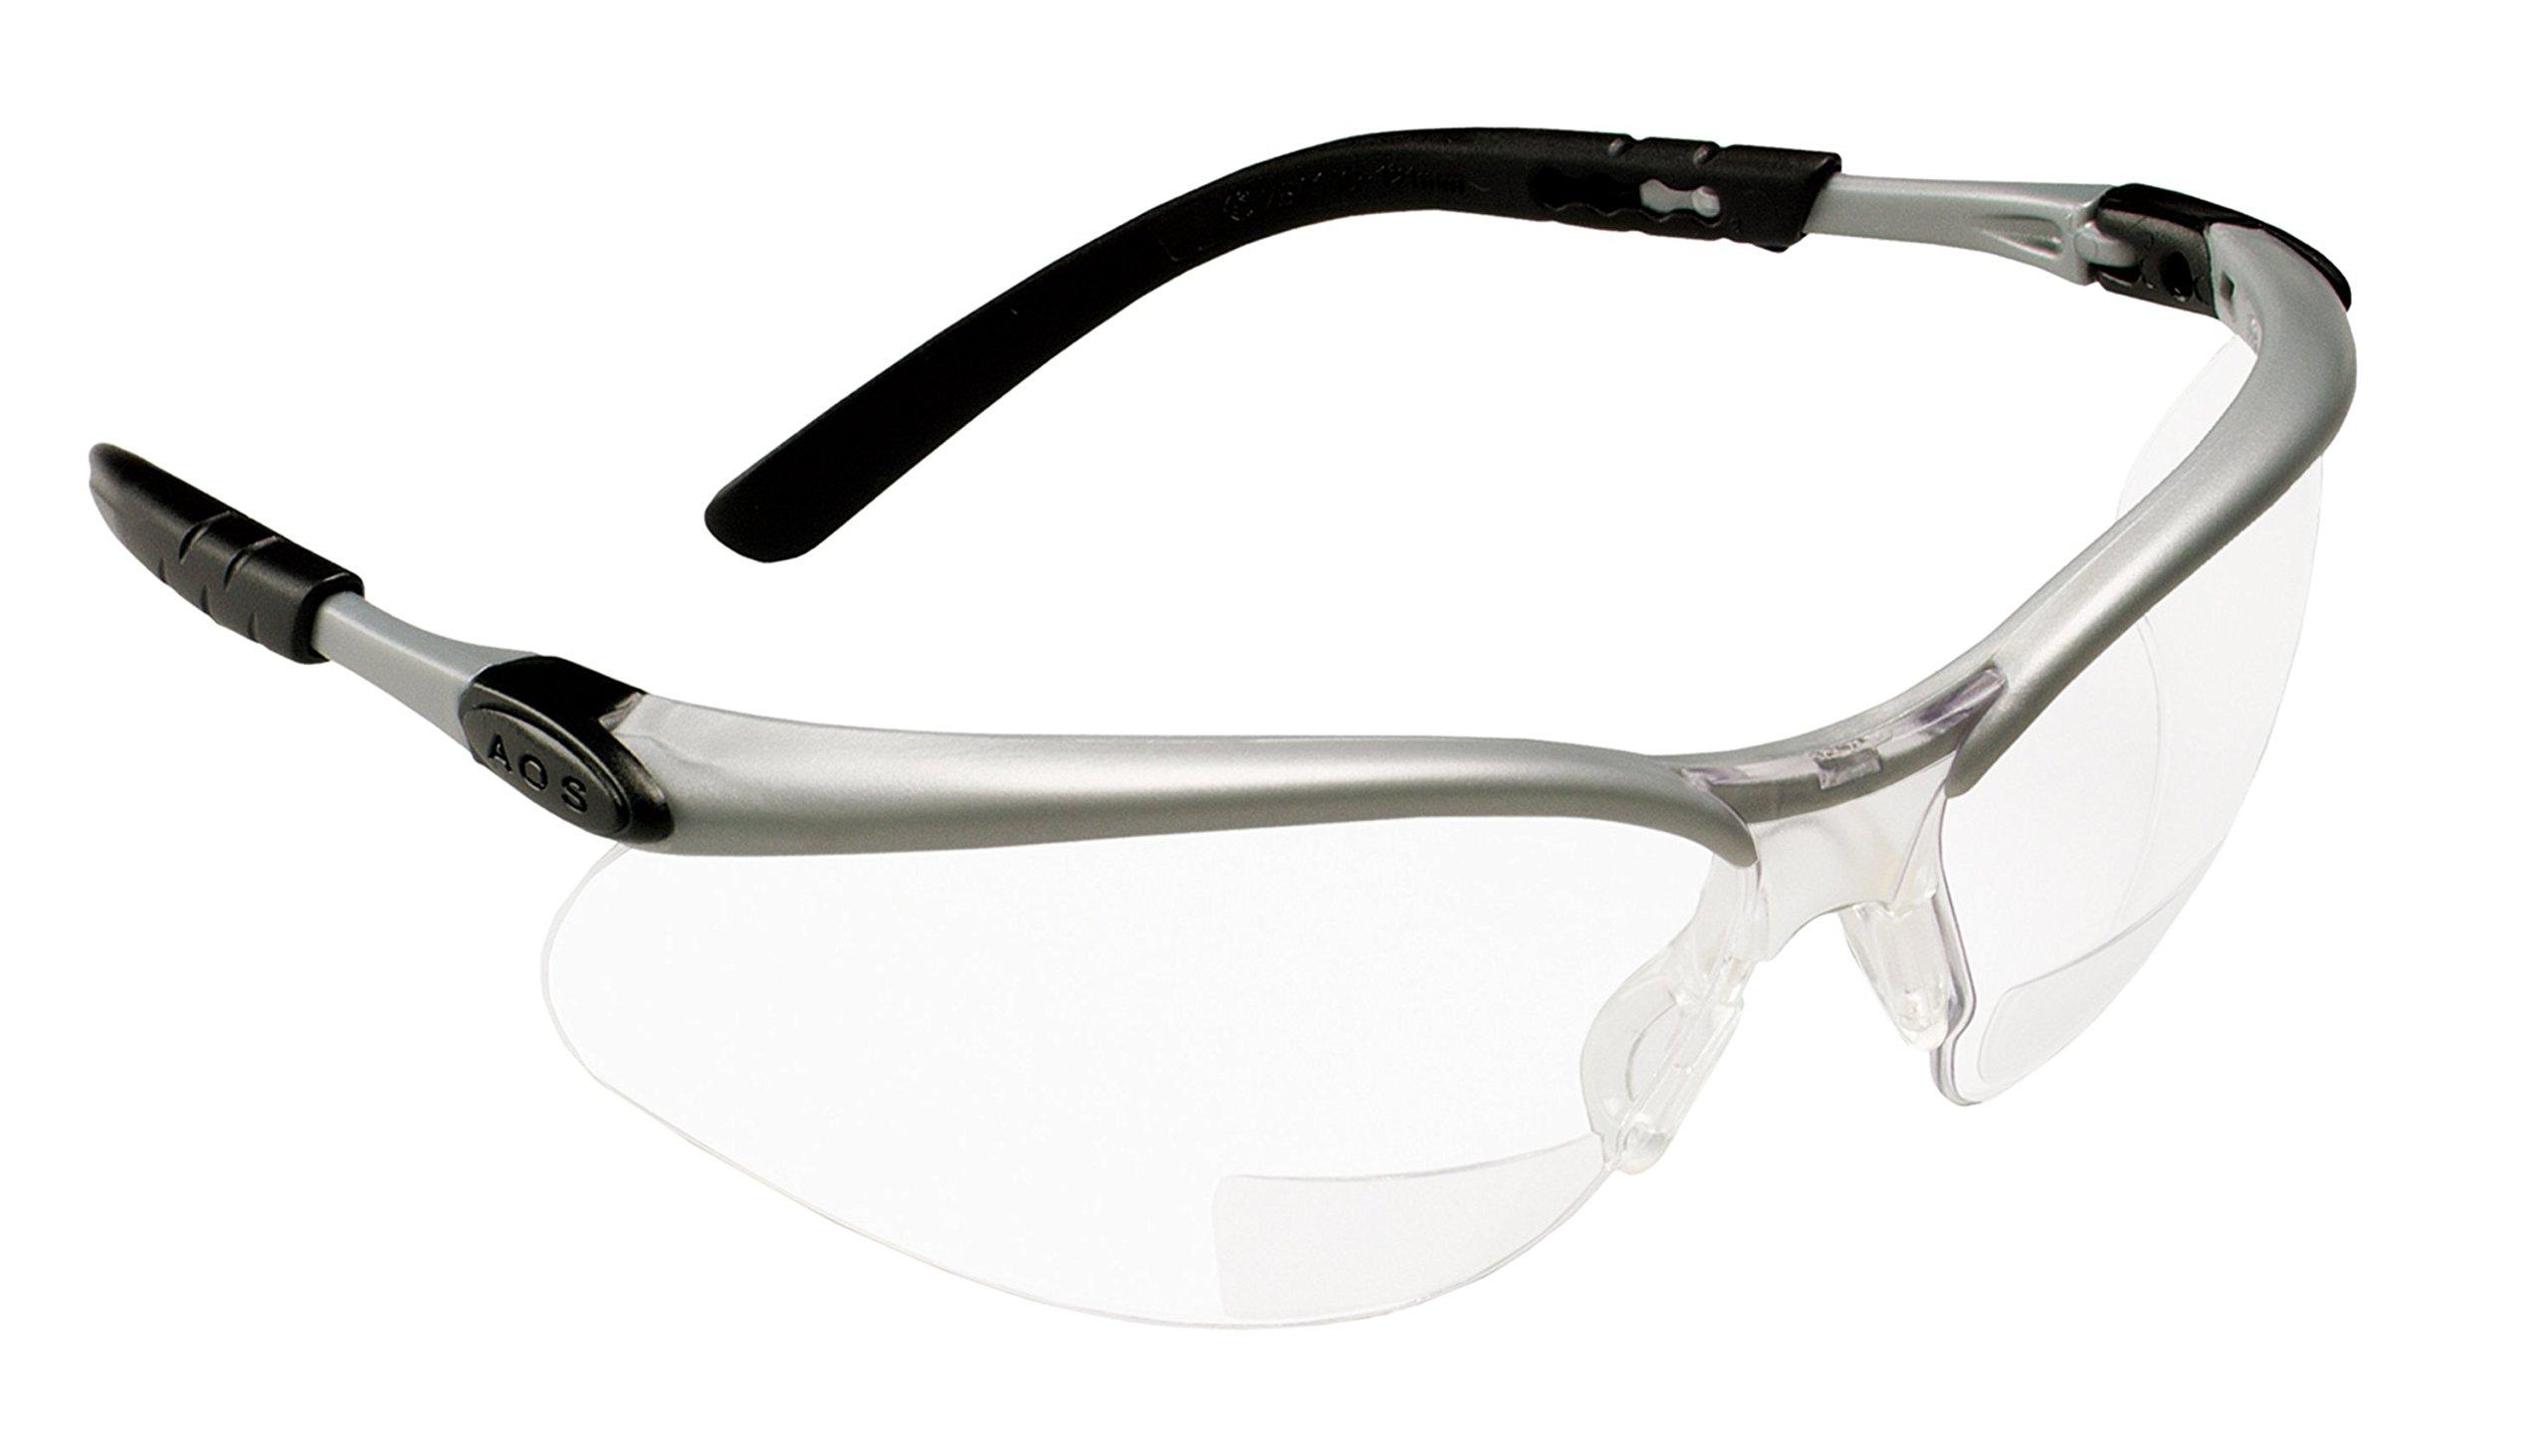 3M Reader +2.5 Diopter Safety Glasses, Silver/Black Frame, Clear Lens